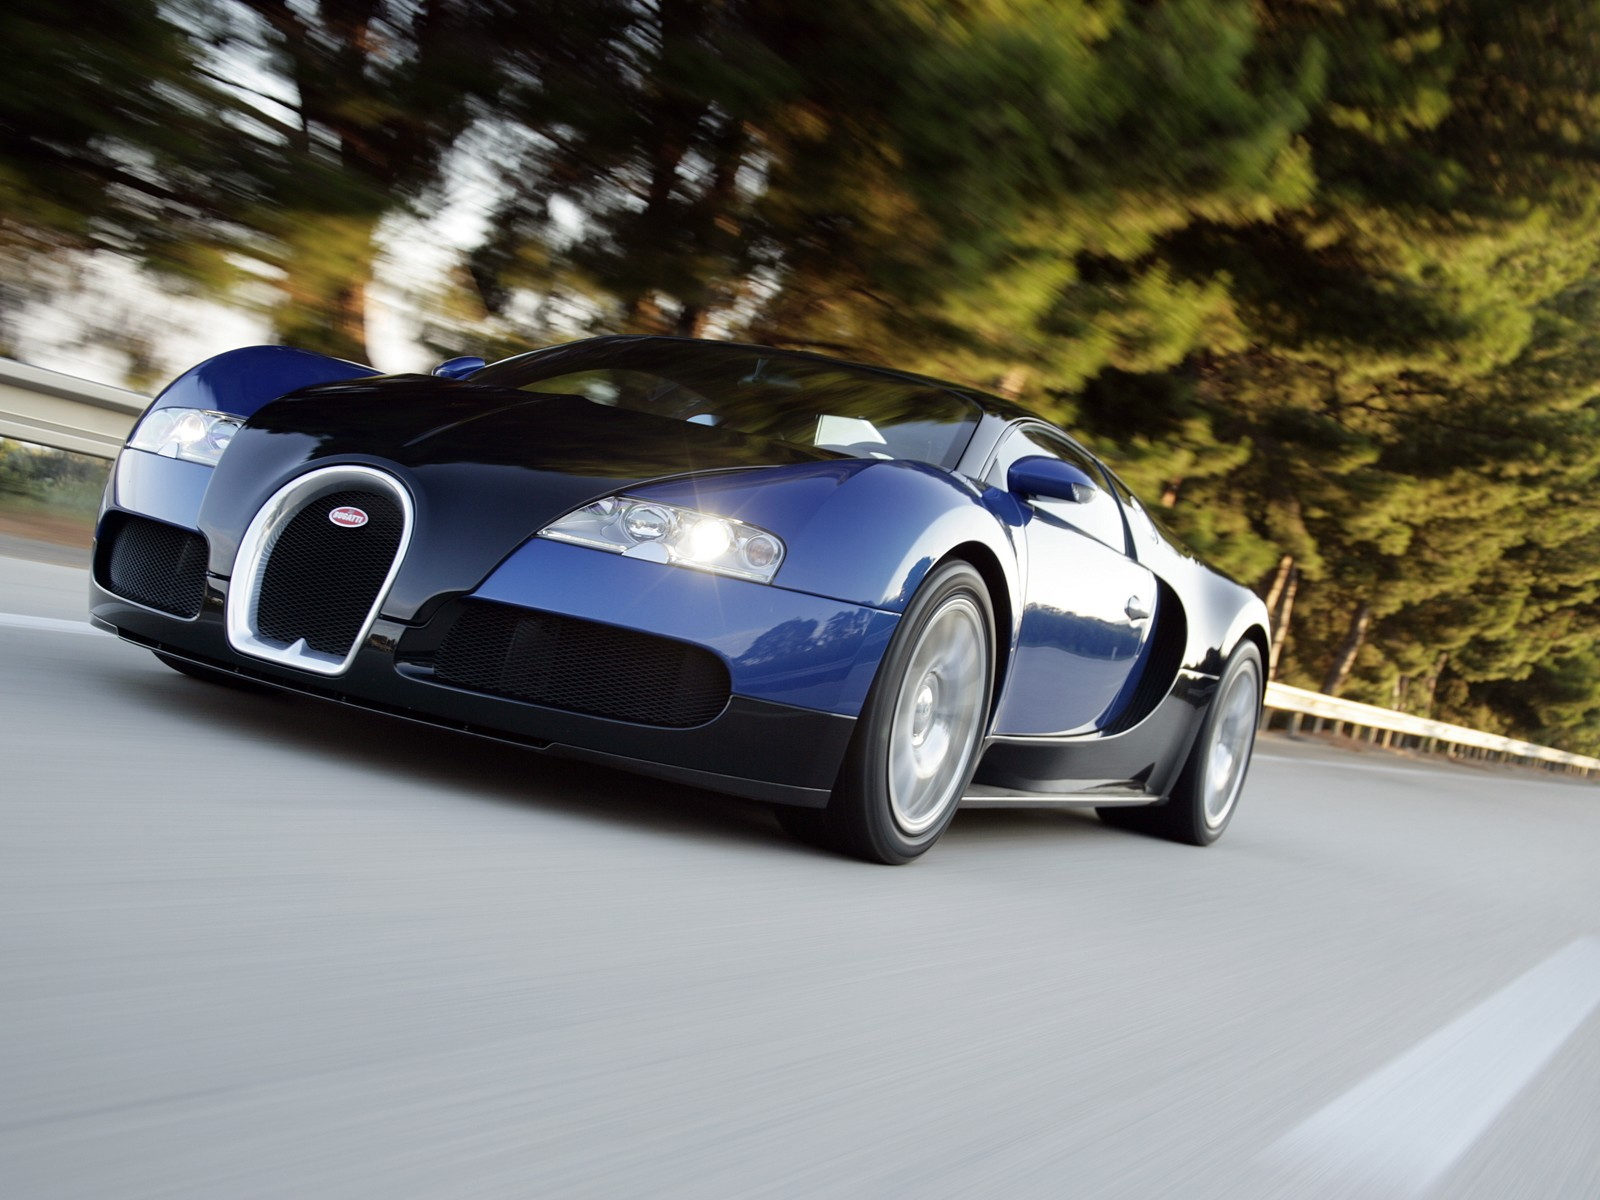 bugatti-veyron-+2 Extraordinary Bugatti Veyron Price List Philippines Cars Trend